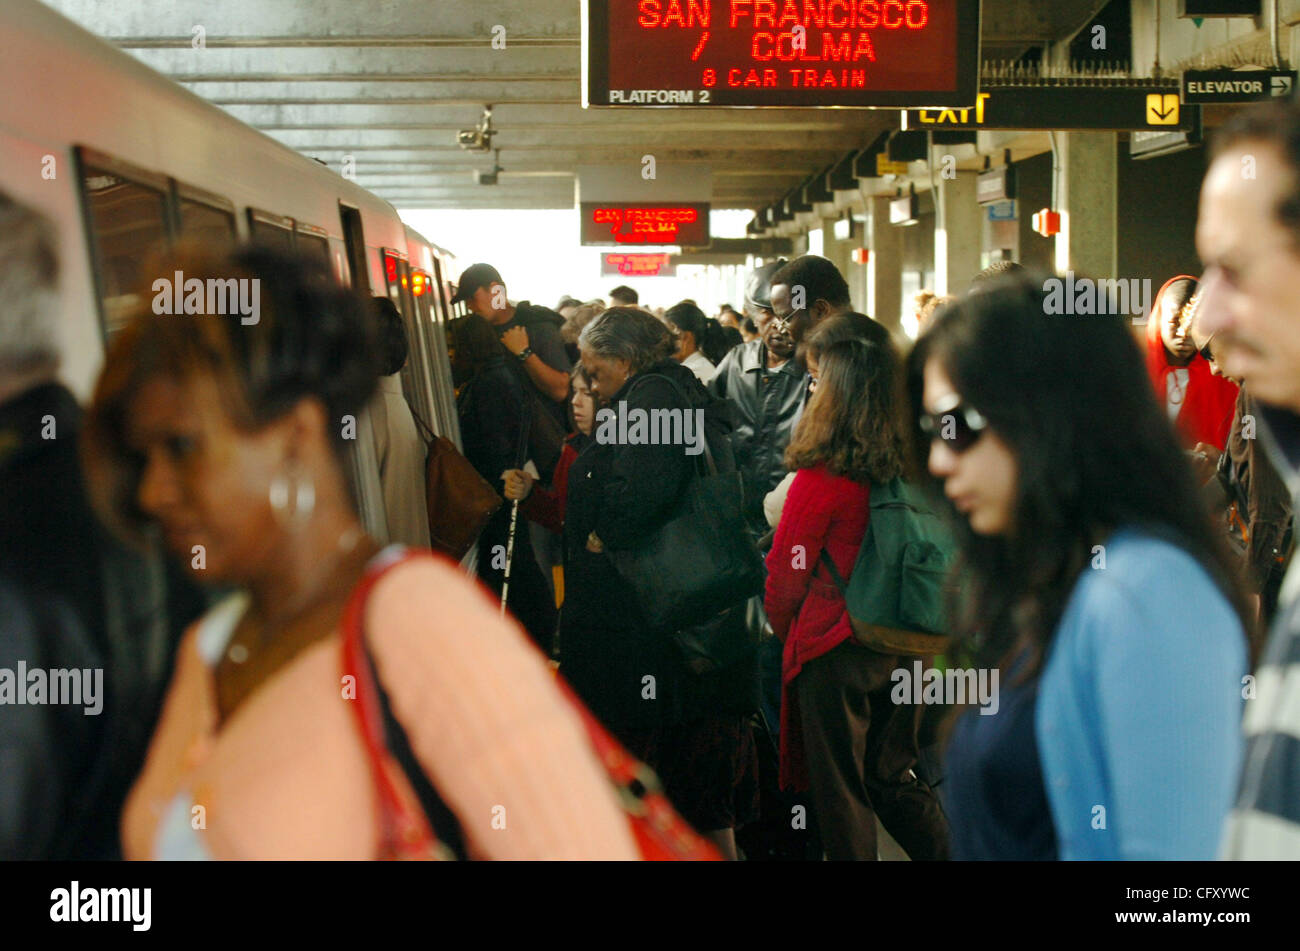 BART riders crowd onto a San Francisco-bound train at the El Cerrito Del Norte station in El Cerrito, Calif., on - Stock Image